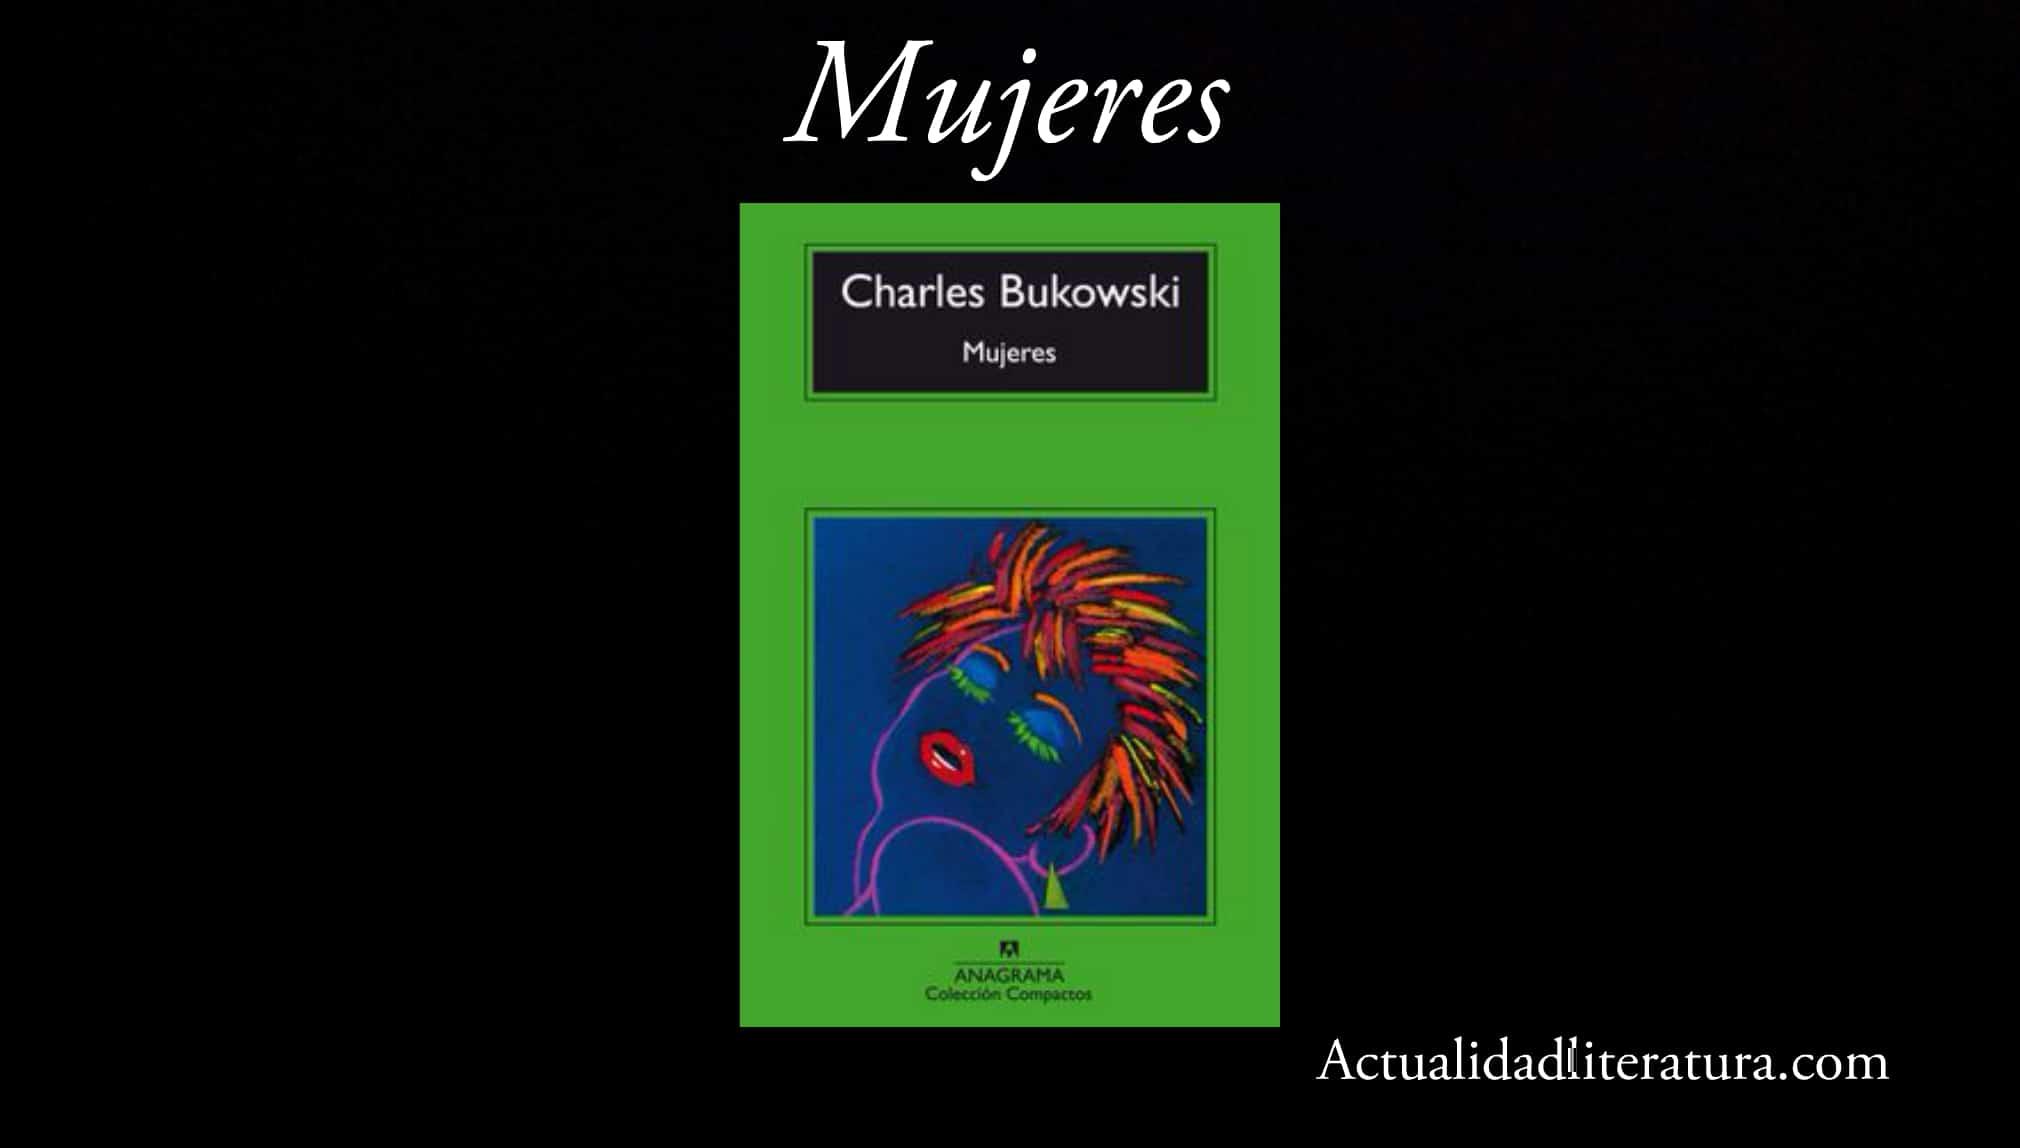 Mujeres, de Charles Bukowski.